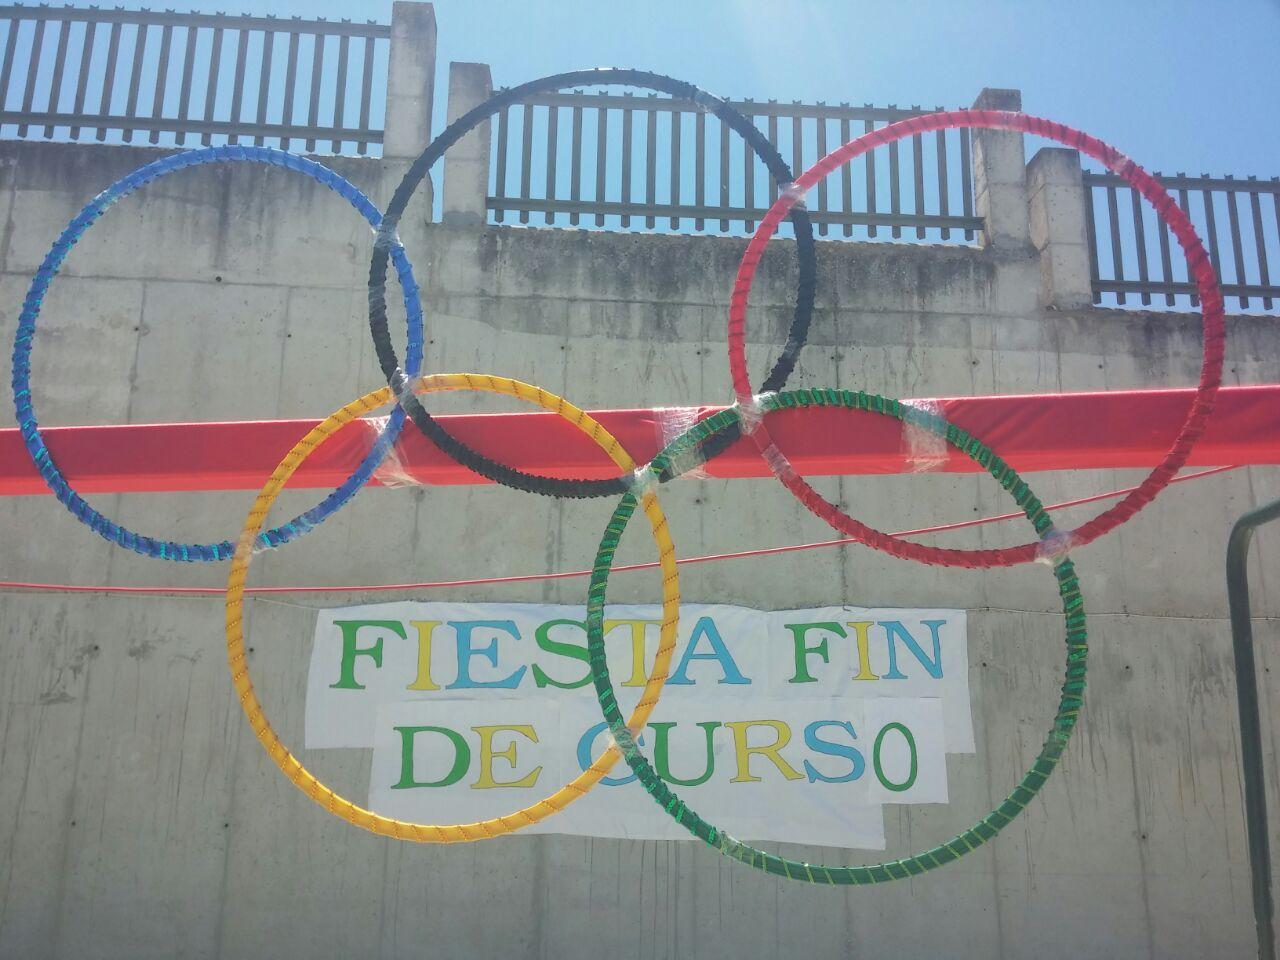 FIESTA FINAL DE CURSO